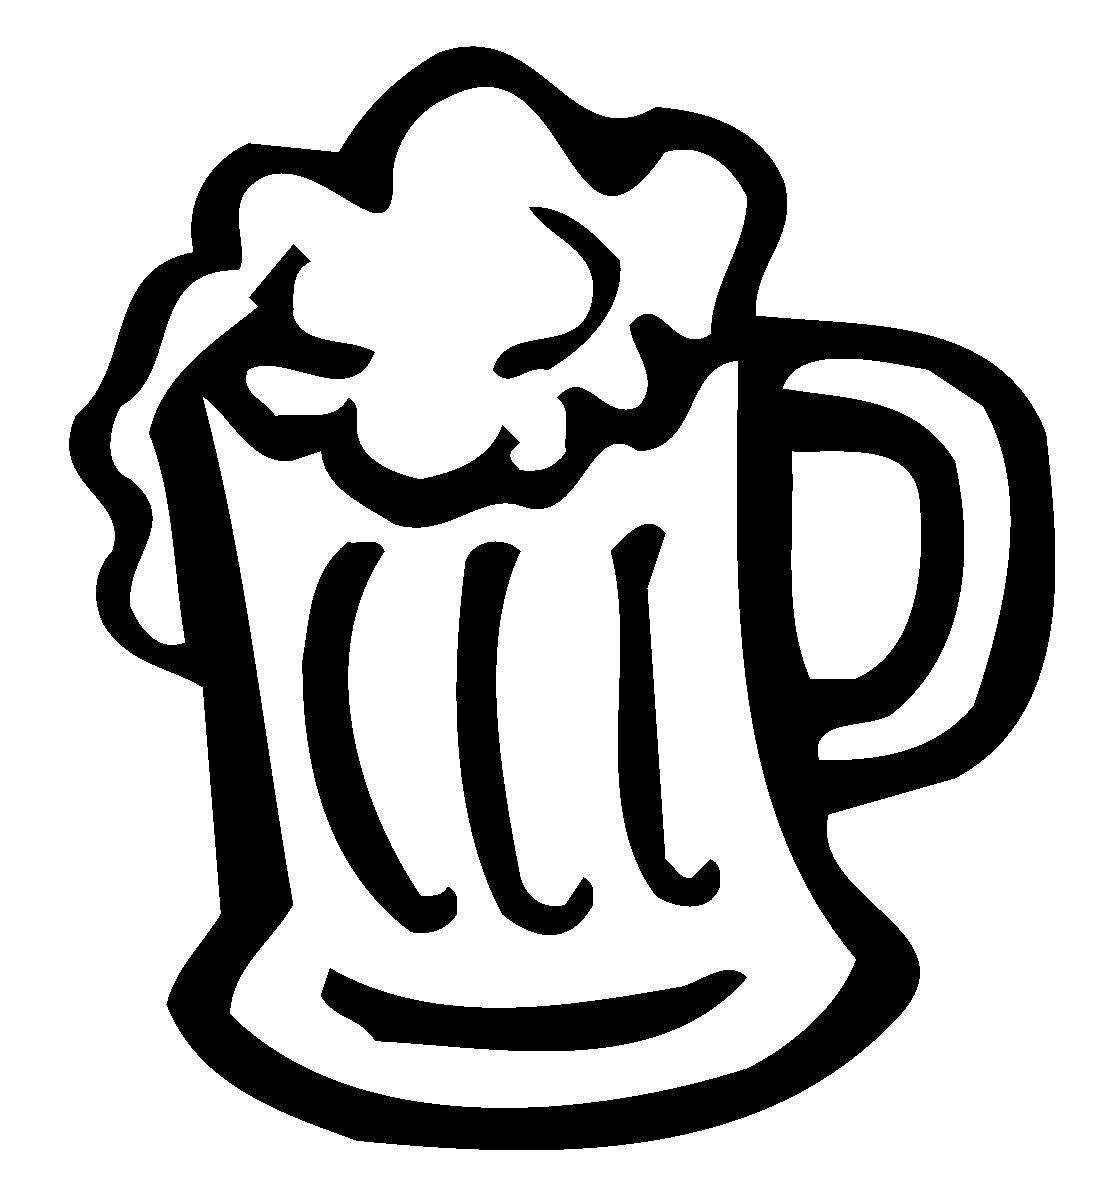 Beer Mug Decal, Beer Mug Sticker.